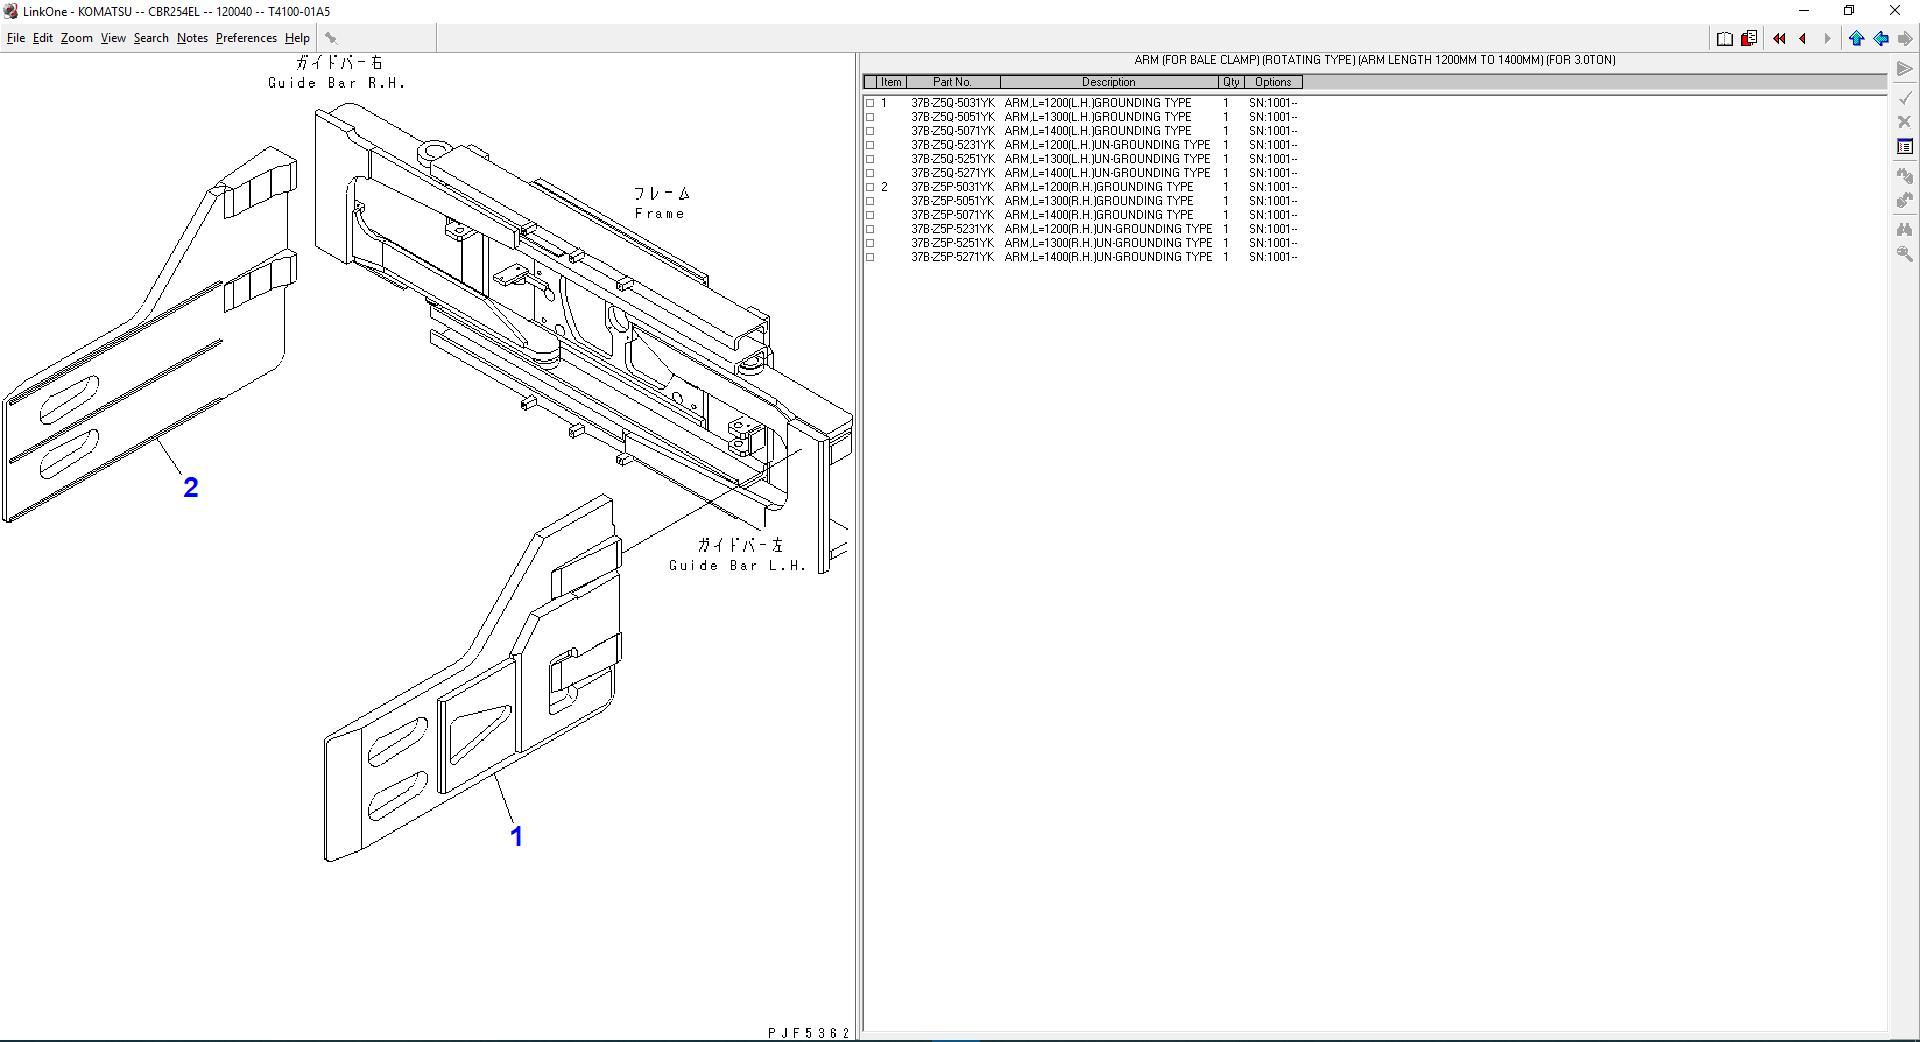 Komatsu_Forklift_Link_One_112012_Spare_Parts_Catalog4